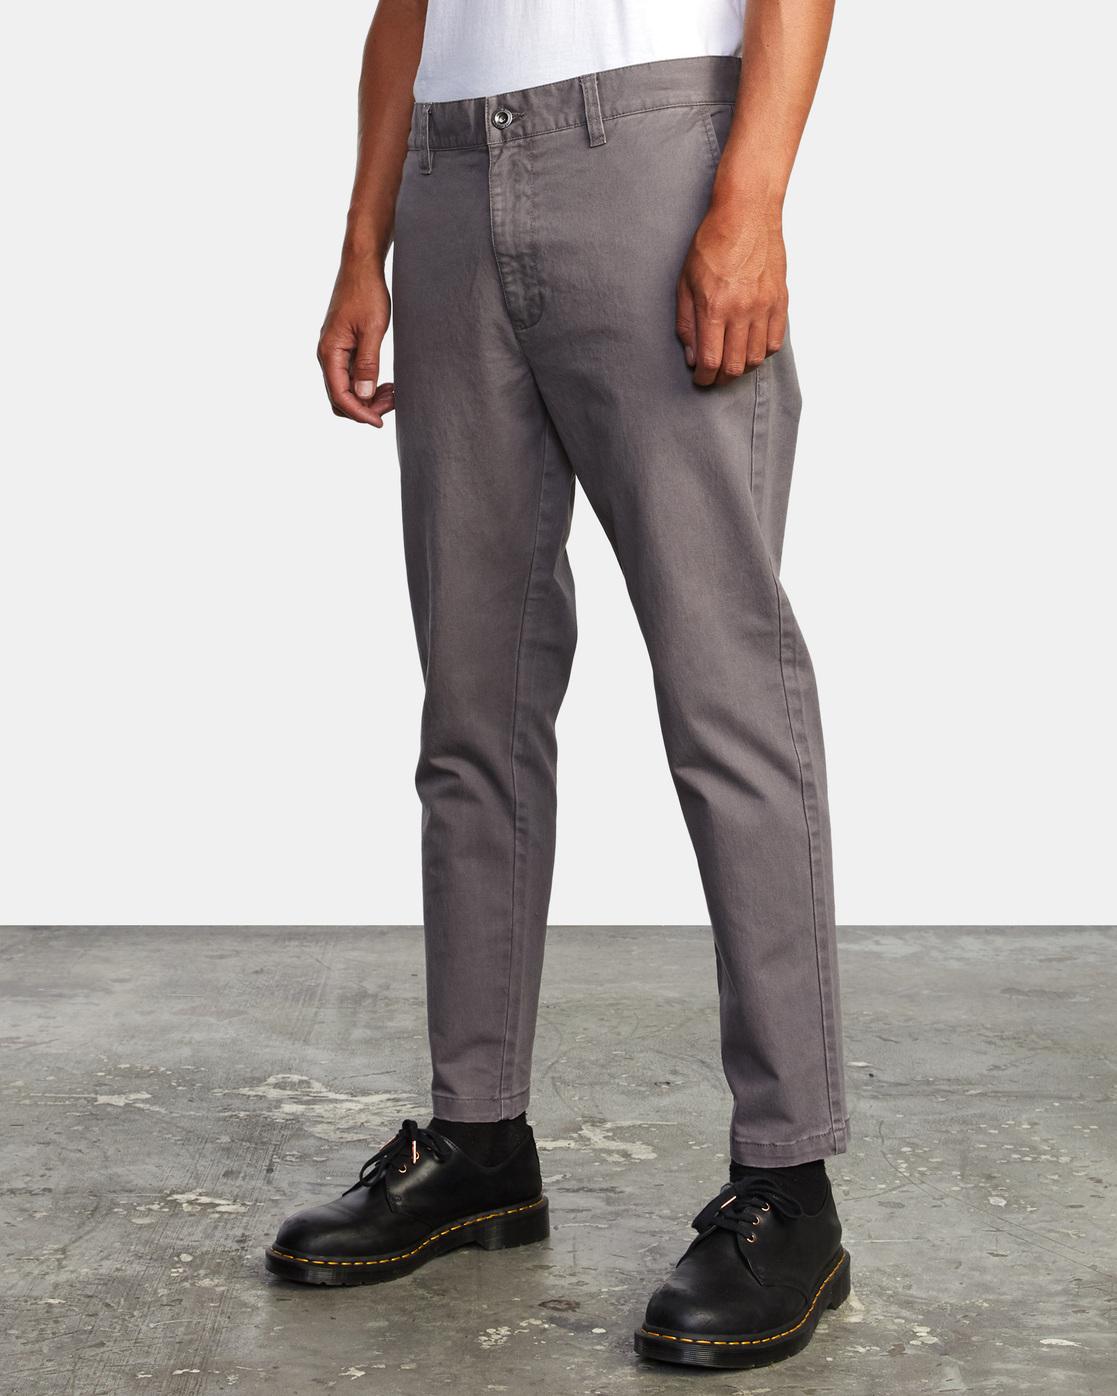 9 HITCHER PANT Grey ME303HIT RVCA